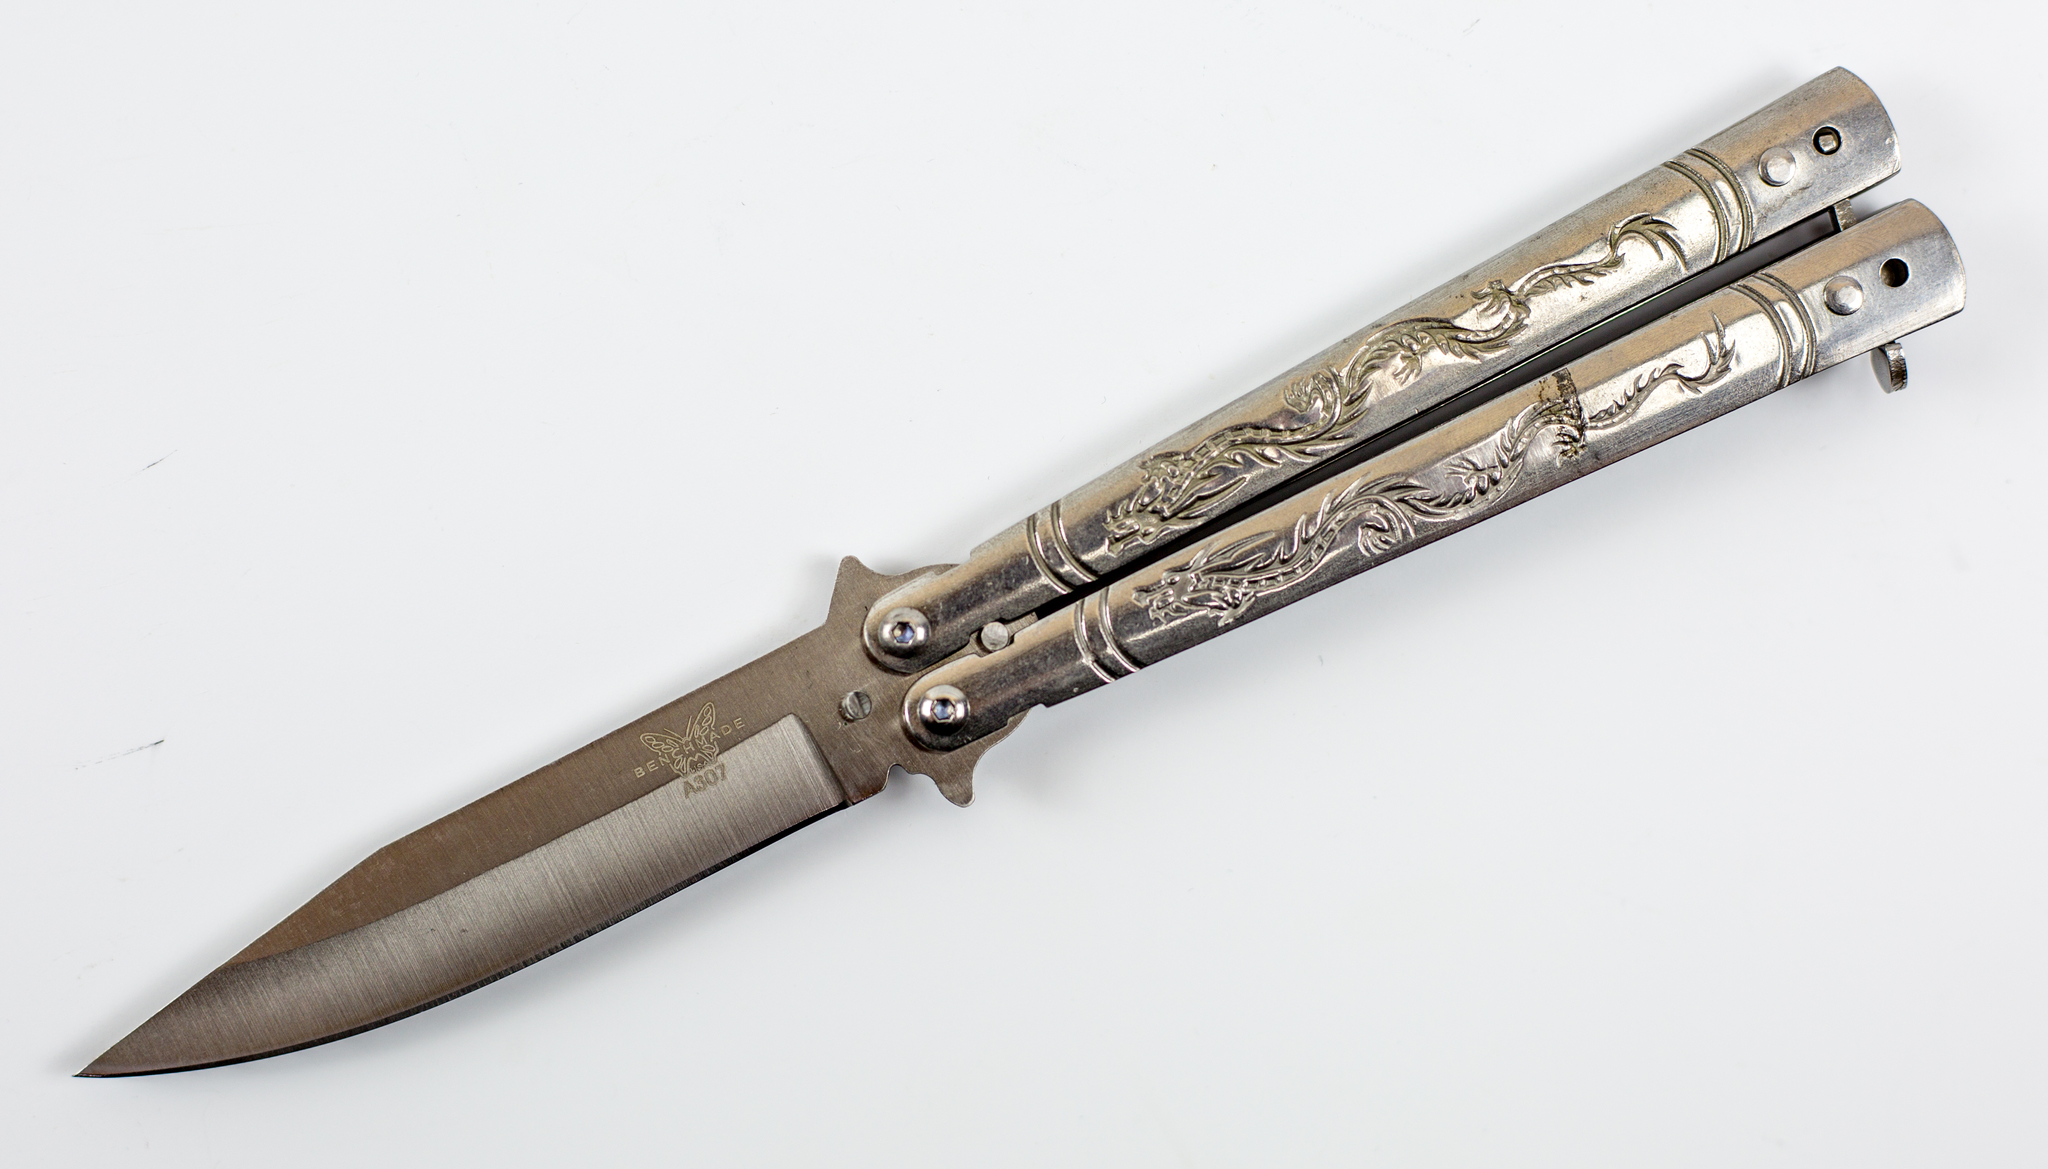 Нож-бабочка (балисонг) Драго